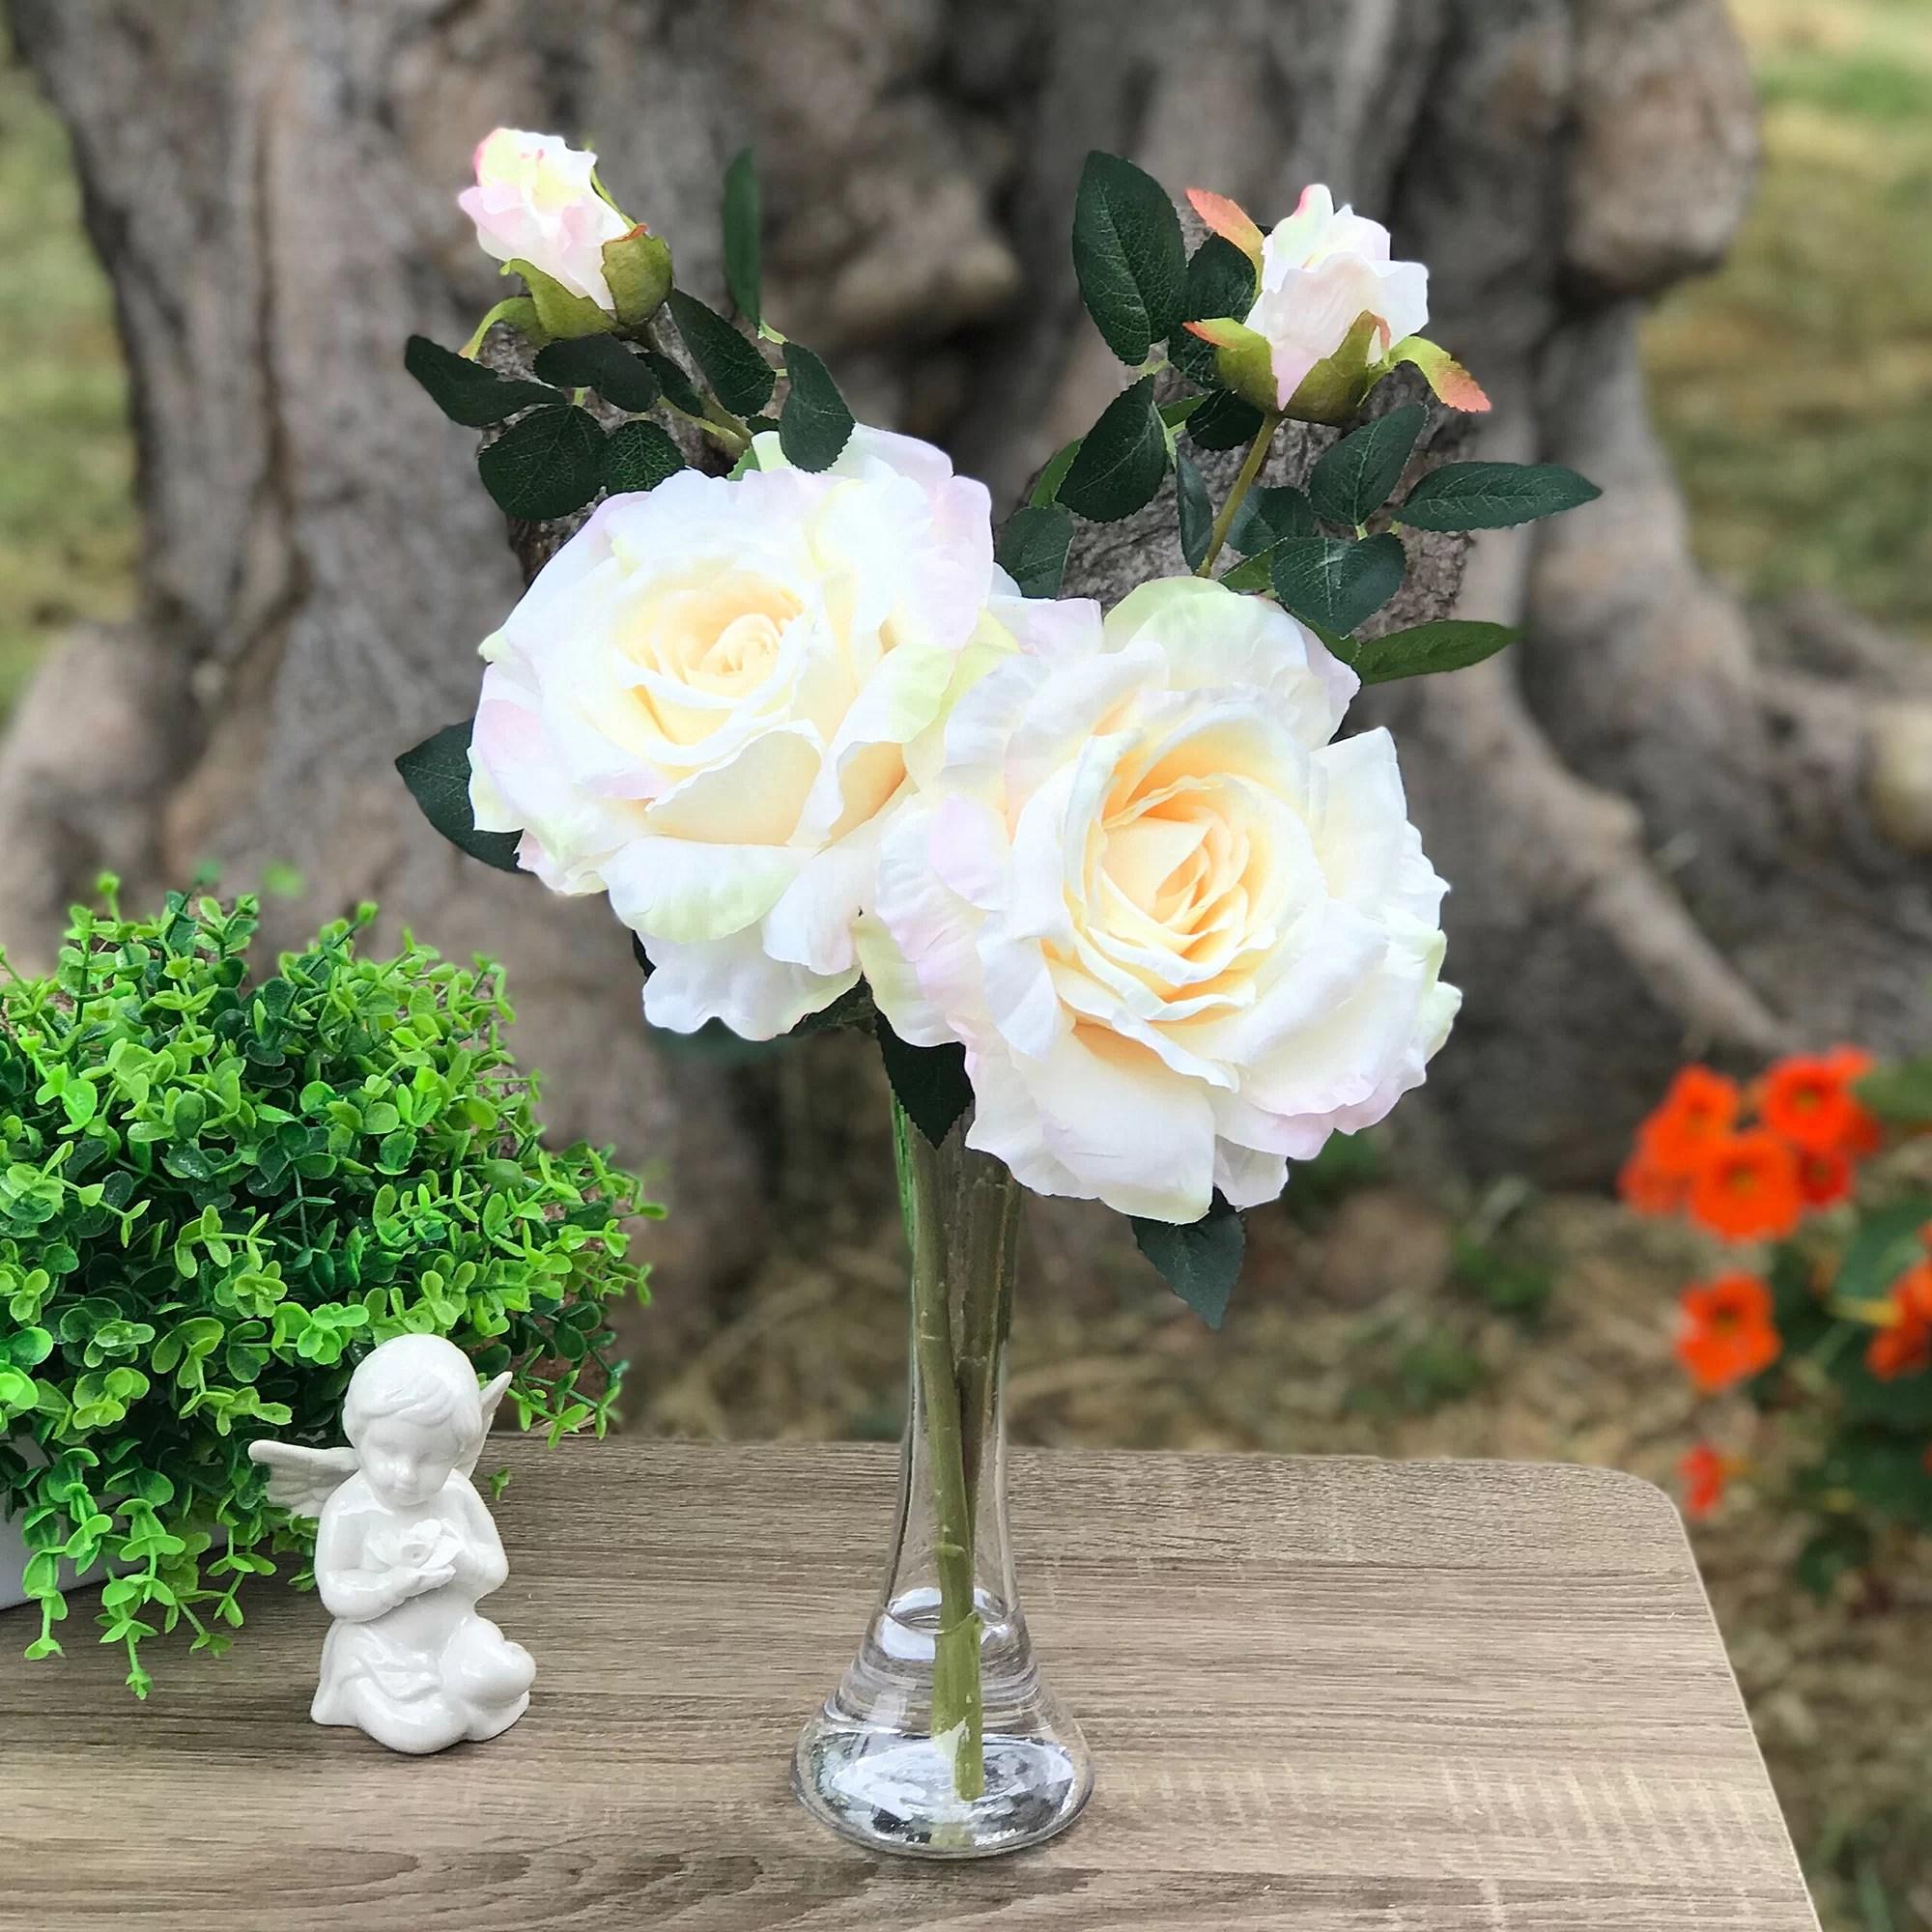 House Of Hampton Large Silk Open Roses Floral Arrangement And Centerpieces In Vase Wayfair